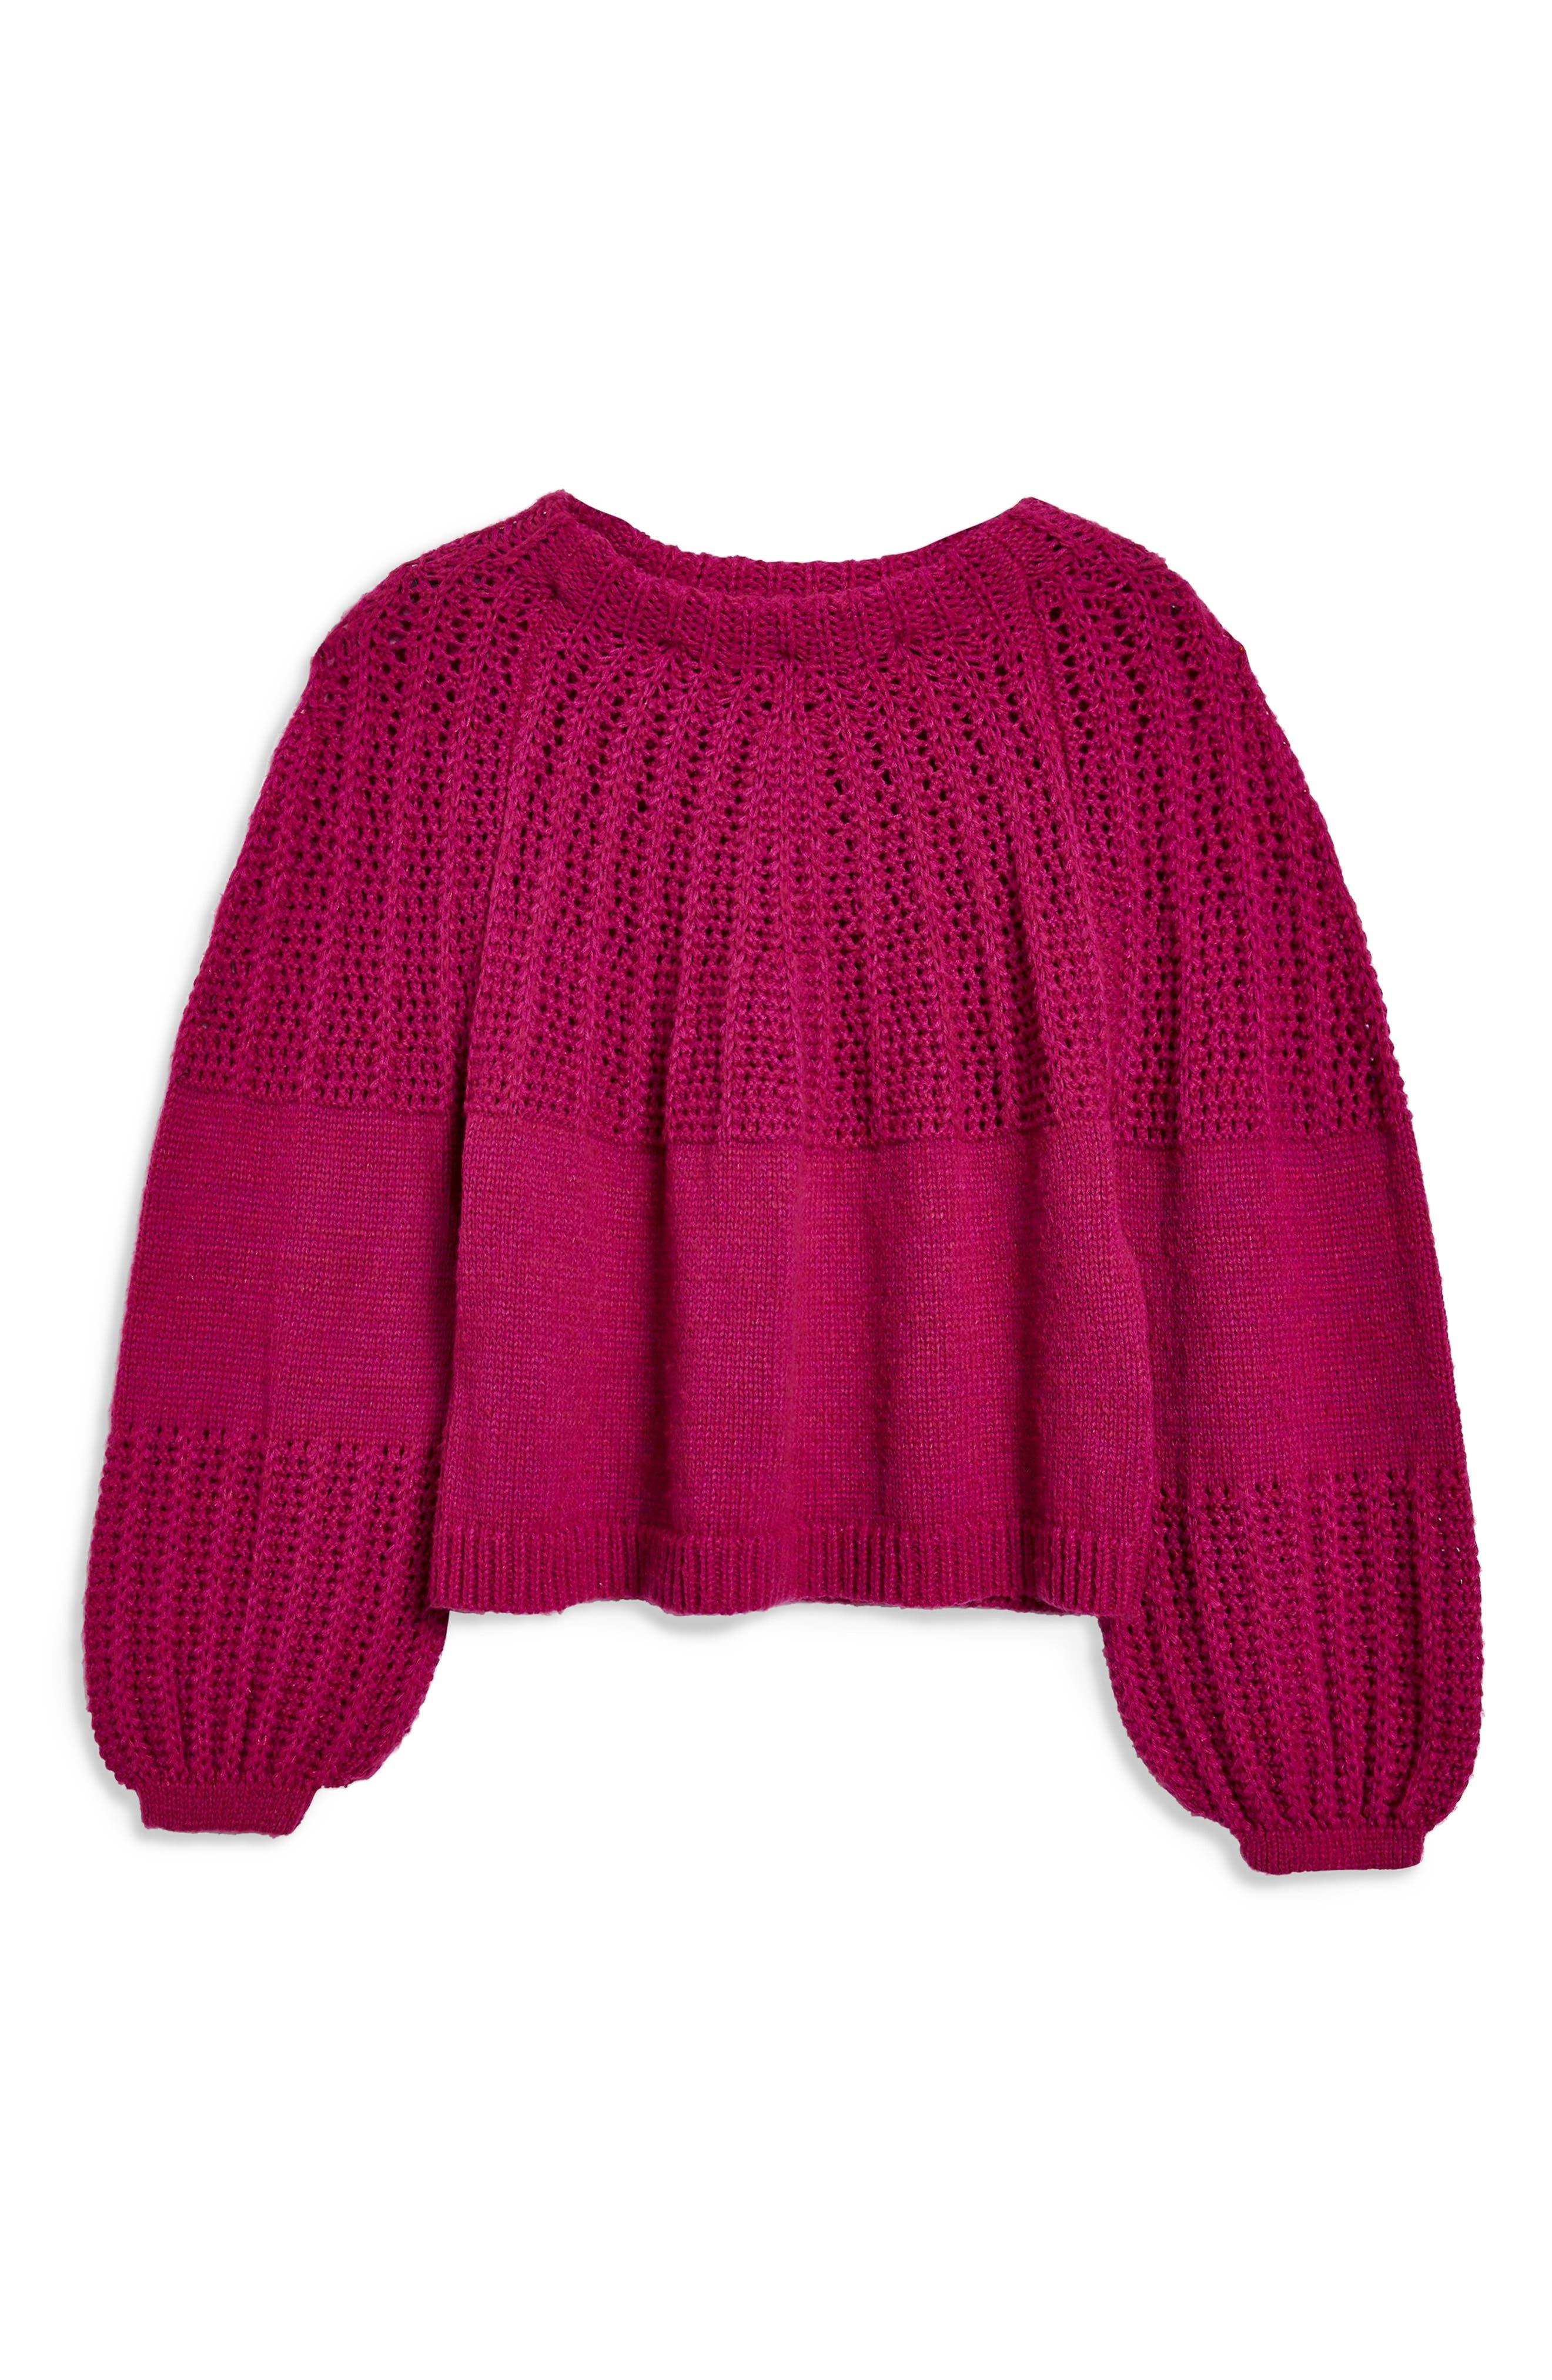 Pointelle Ball Sleeve Sweater,                             Alternate thumbnail 3, color,                             500